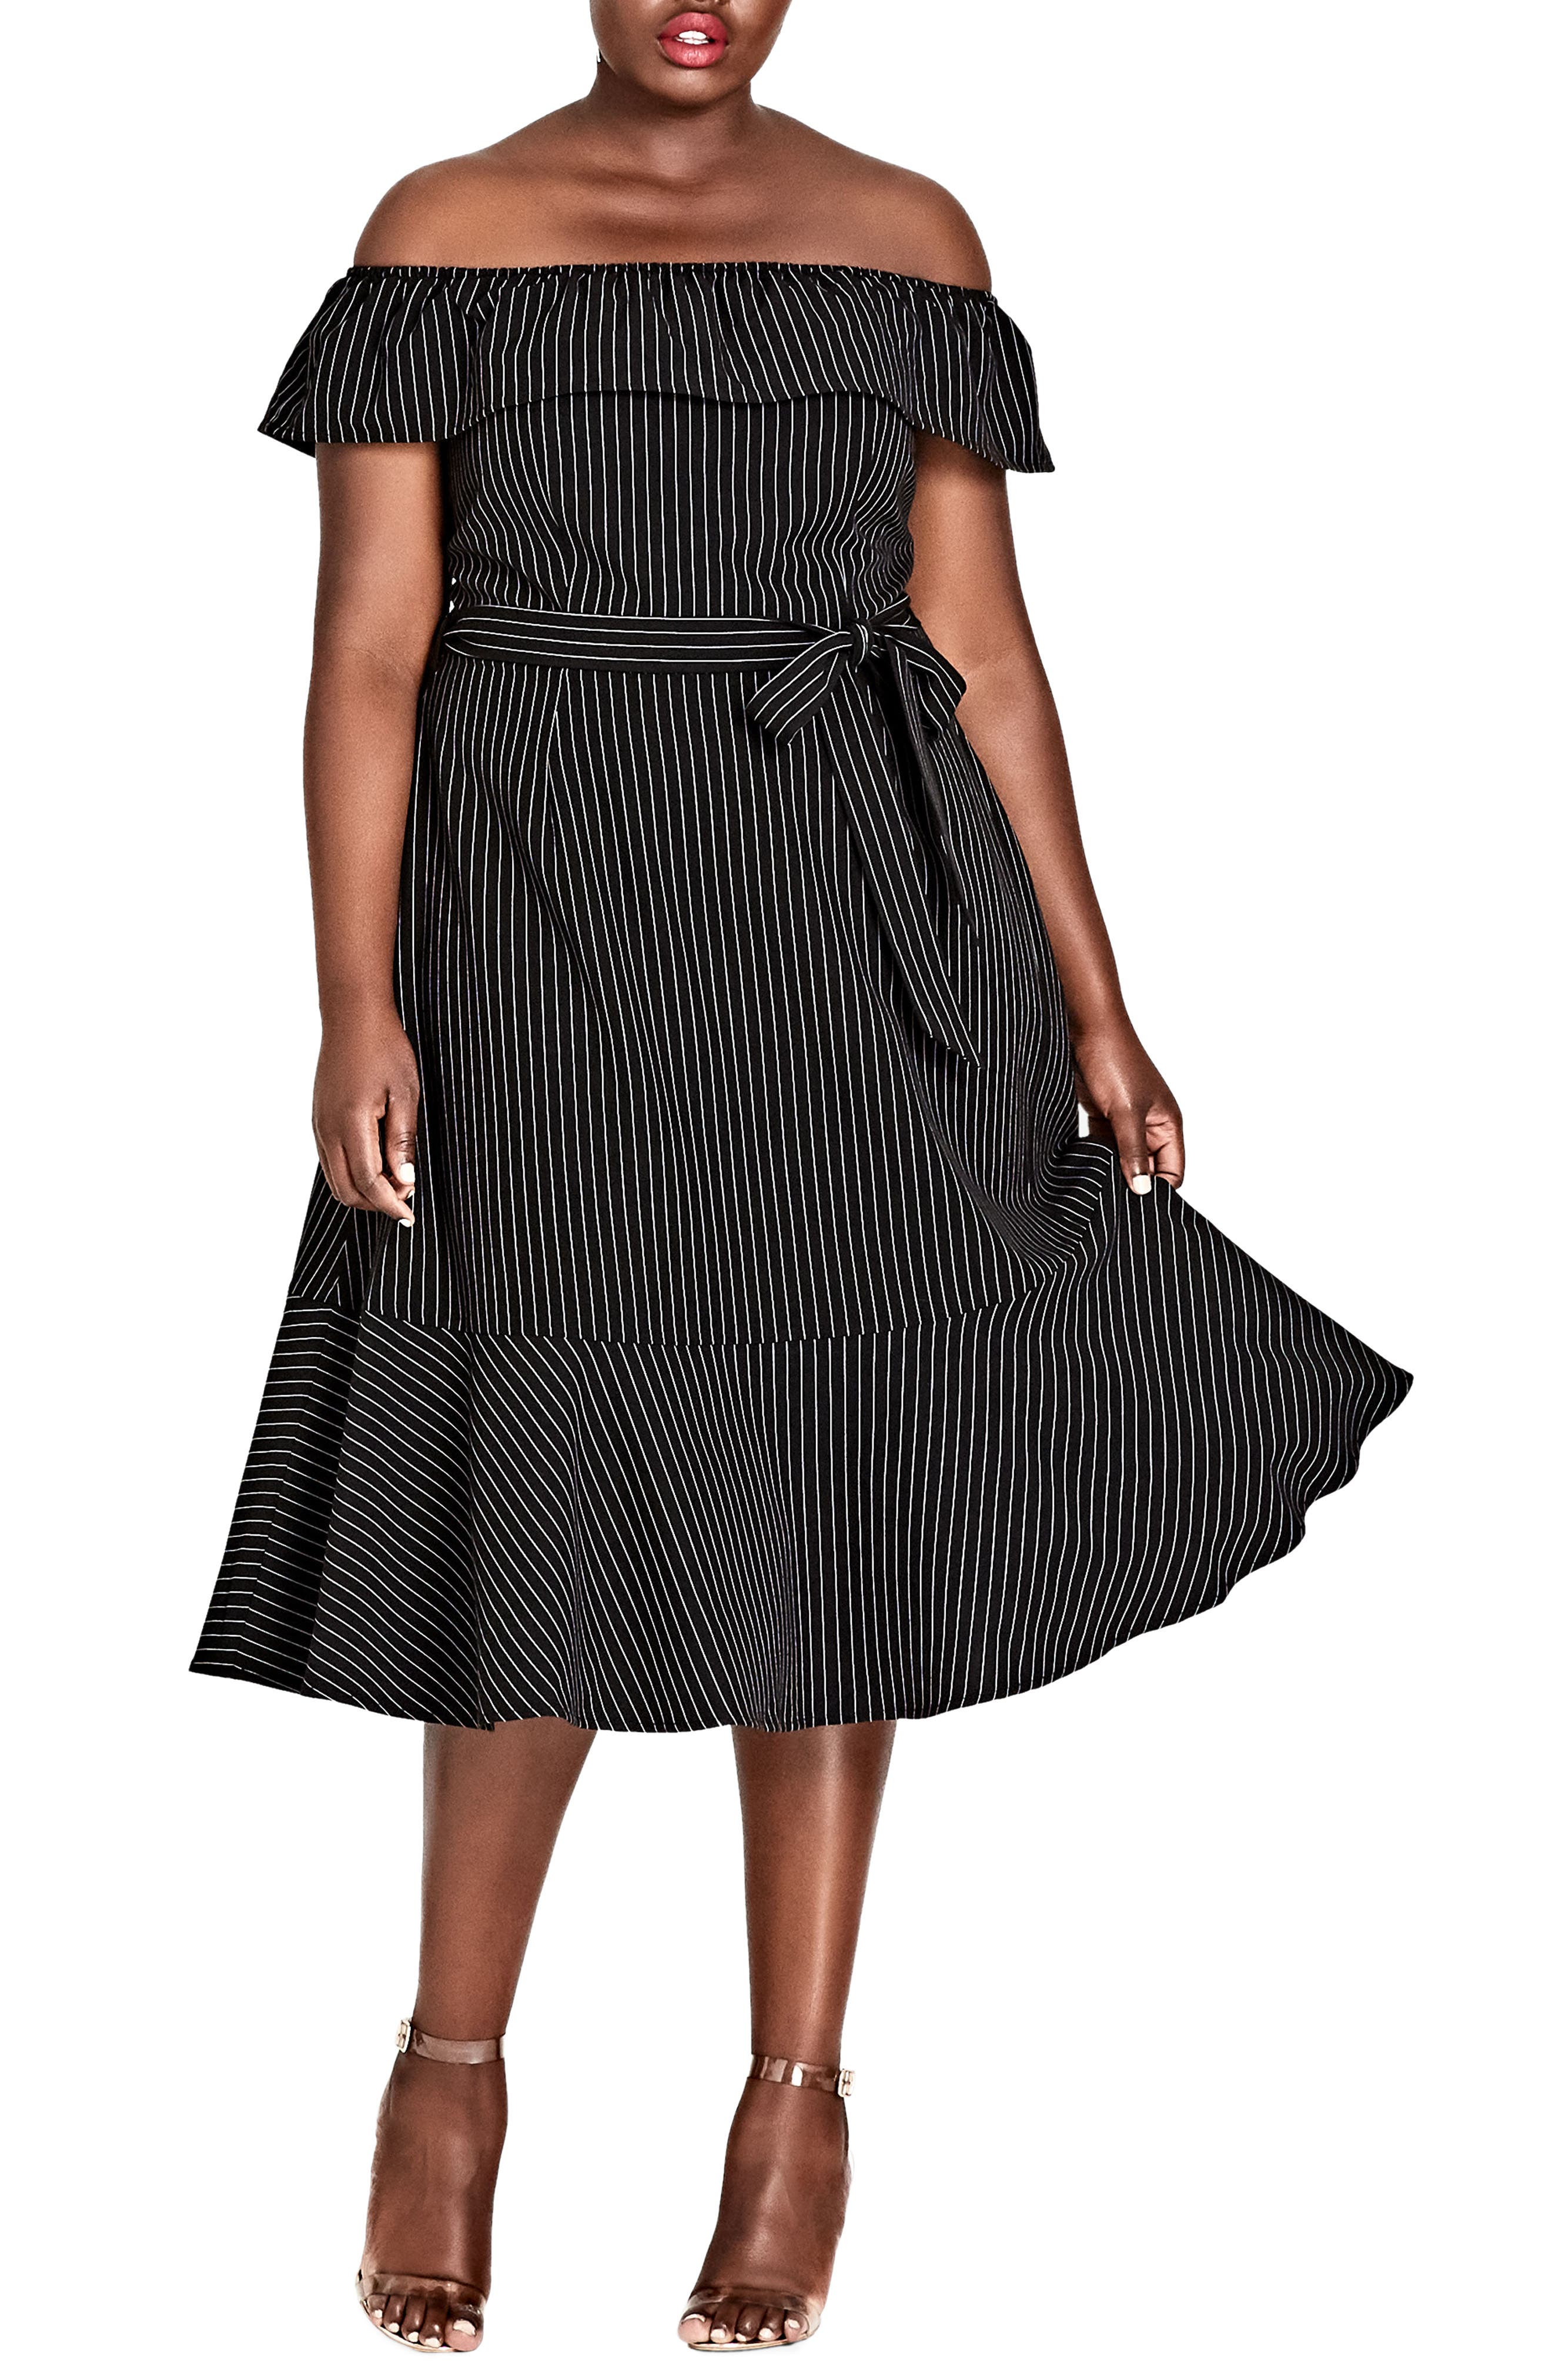 CITY CHIC,                             Midi Madame Stripe Off the Shoulder Dress,                             Main thumbnail 1, color,                             BLACK